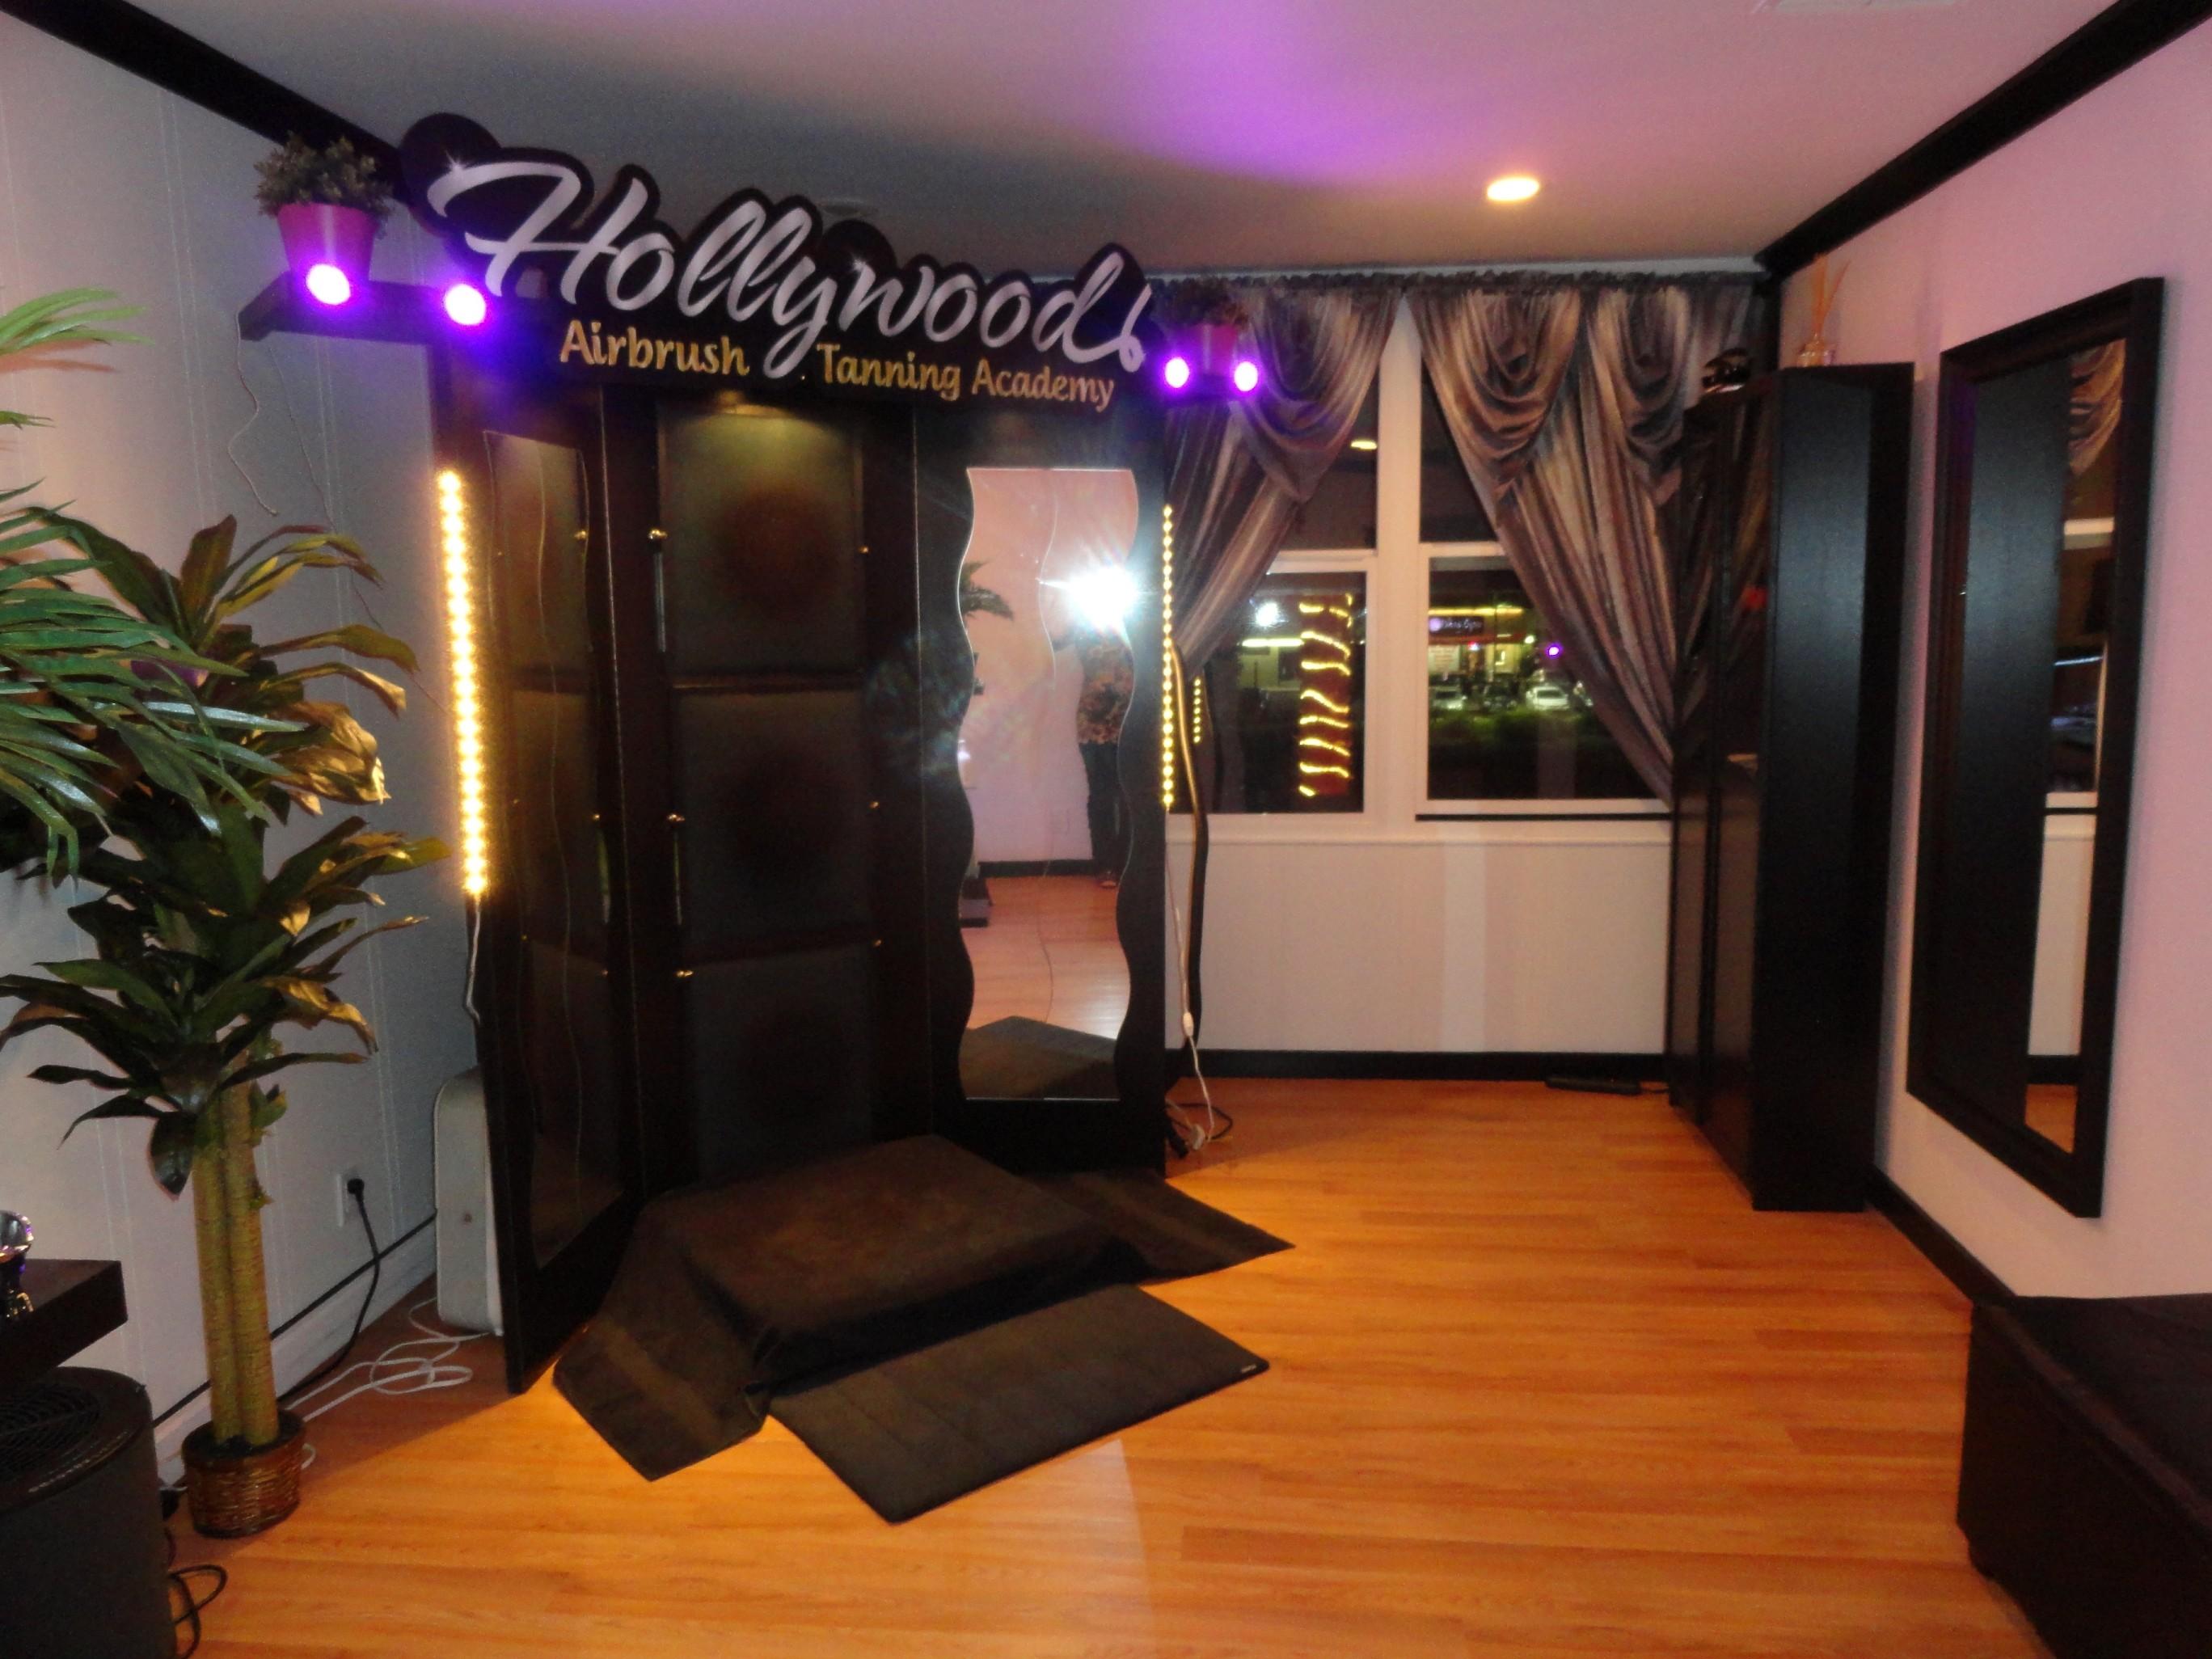 Hollywood Airbrush Tanning Academy New Spray Tanning & Training Studio